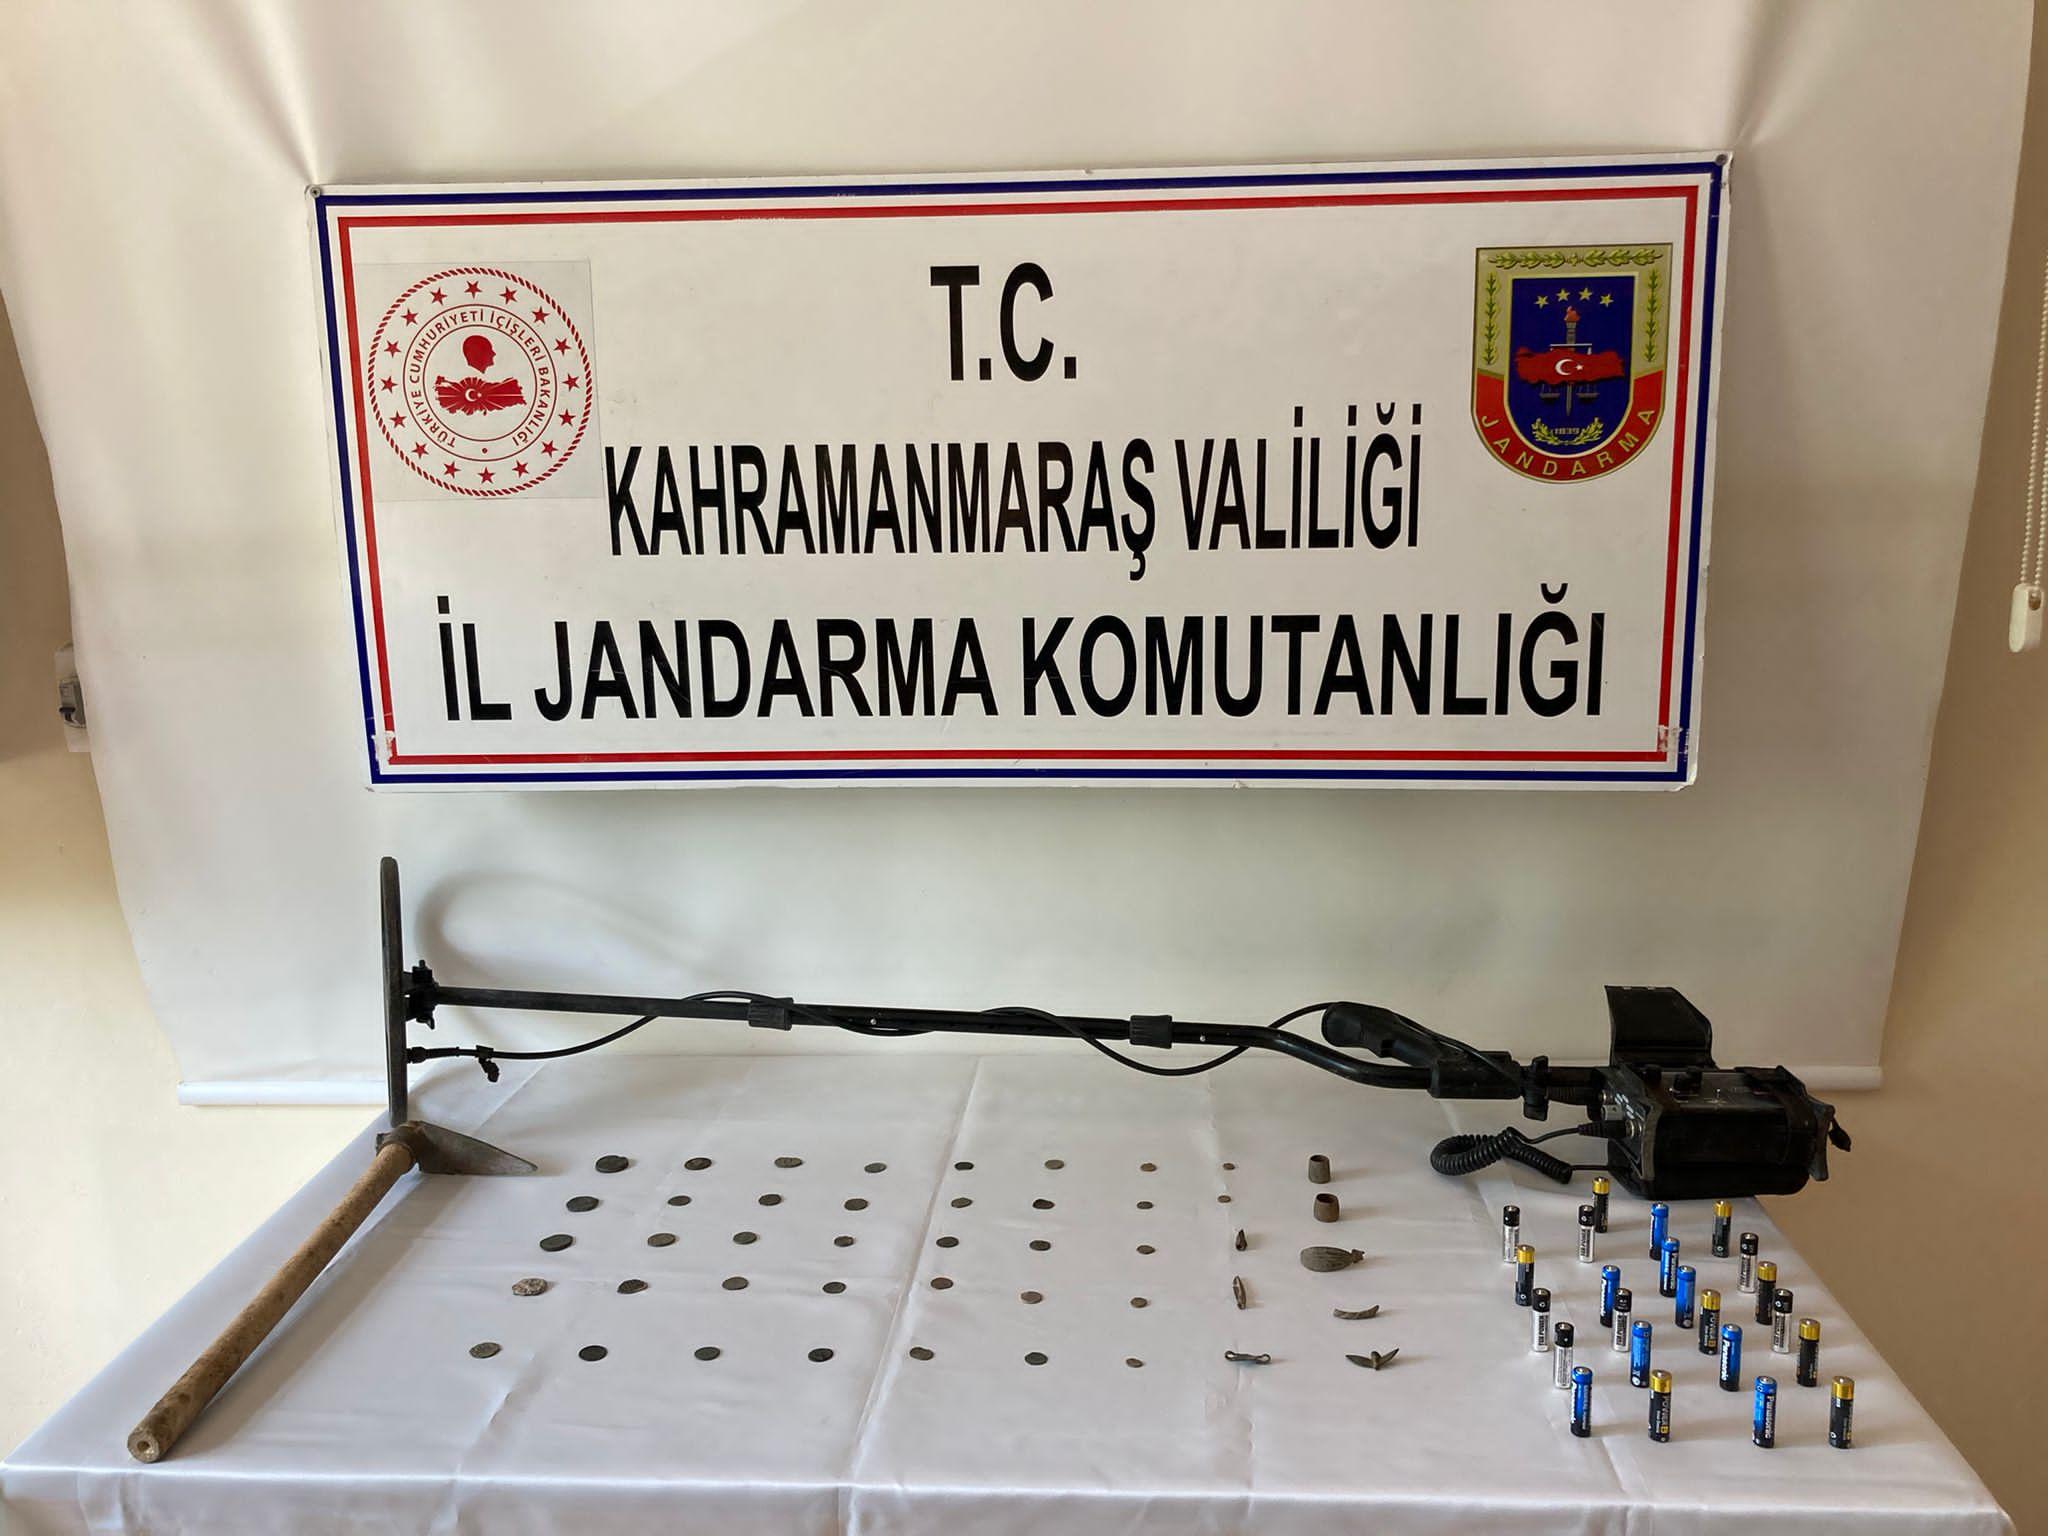 Kahramanmaraş'ta jandarma 45 tarihi eseri ele geçirdi